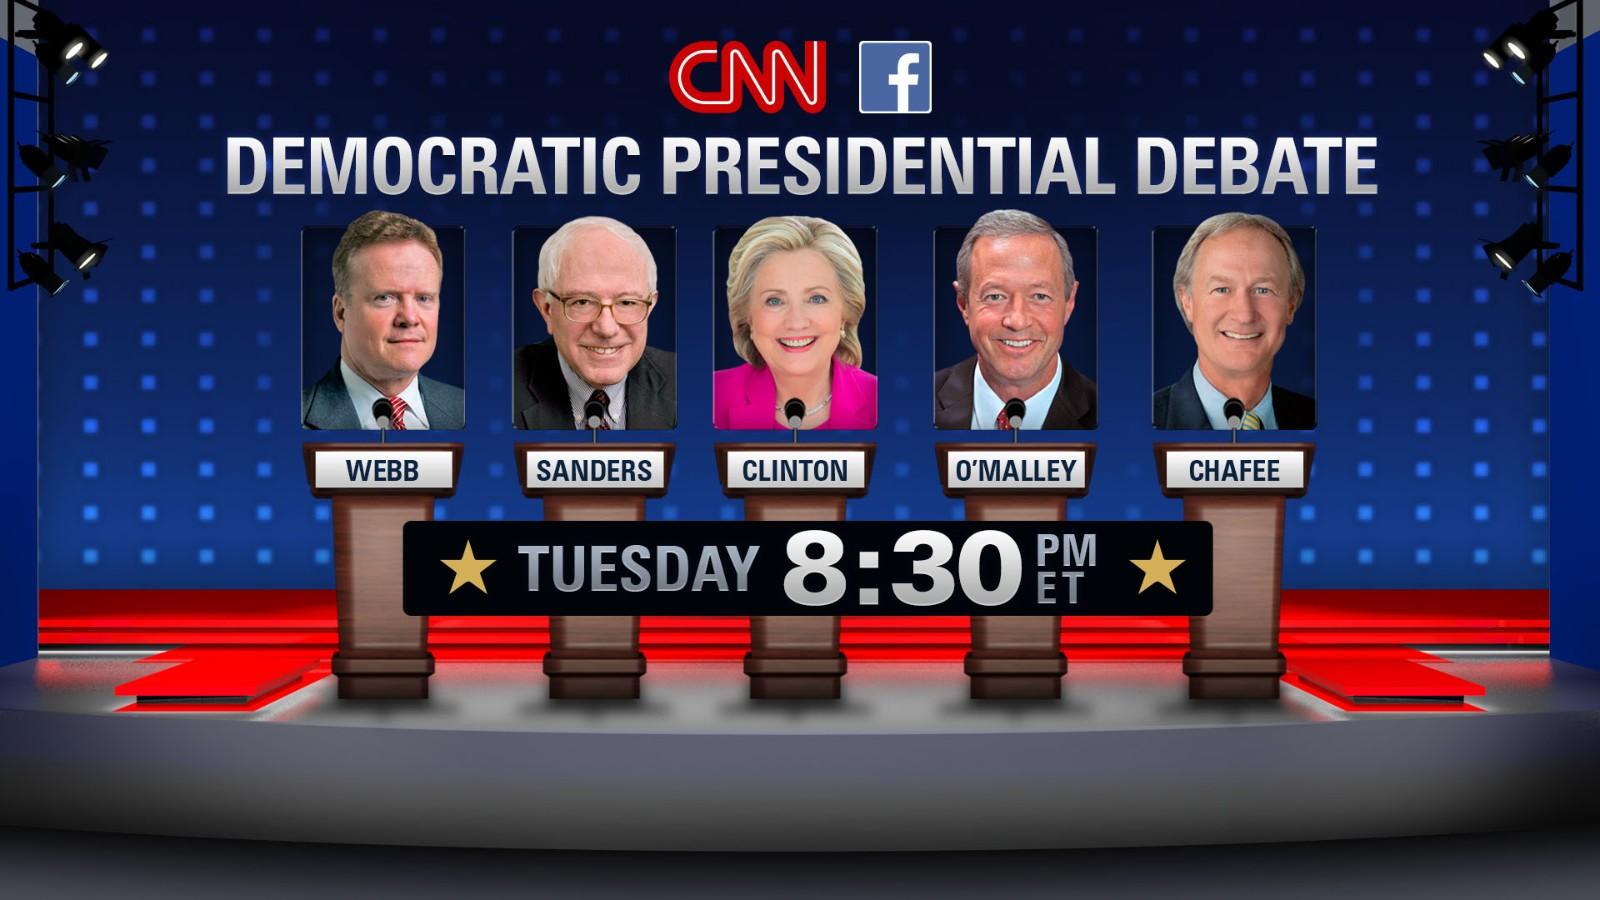 democratic debate 2015 cnn releases podium order cnnpolitics